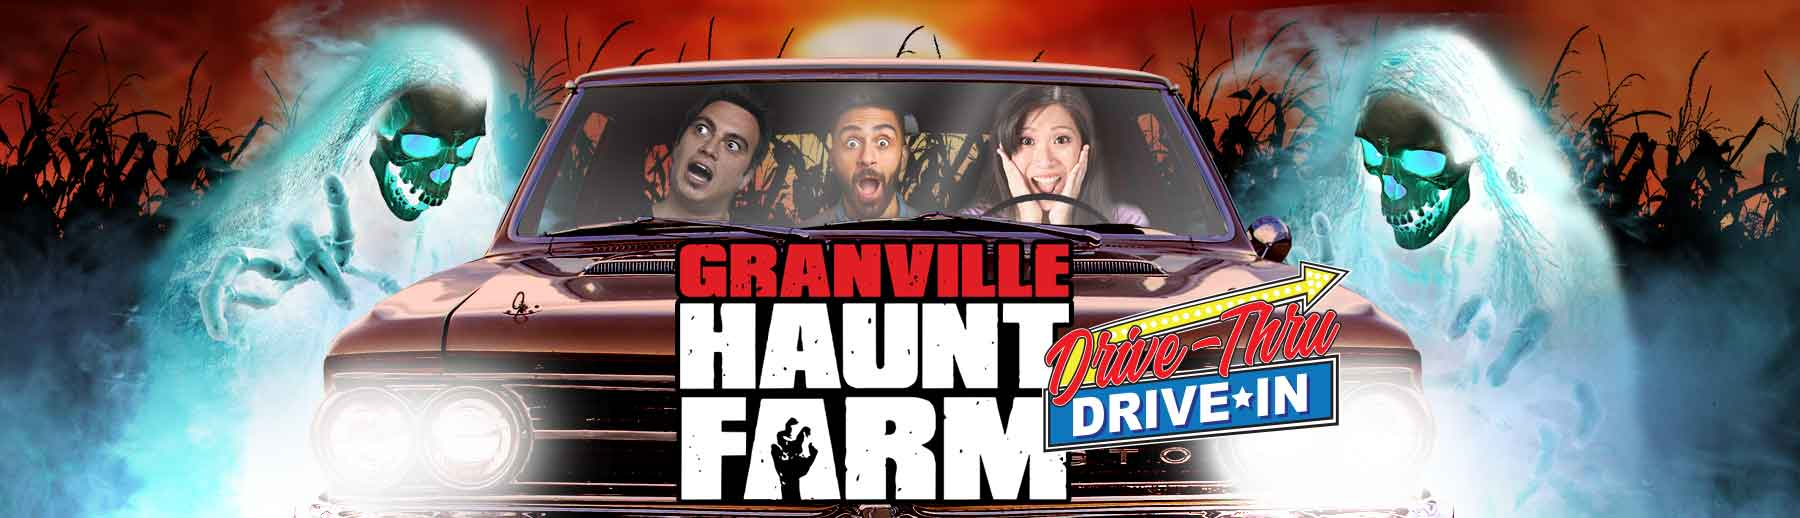 Scream Your Way In: Granville Haunt Farm